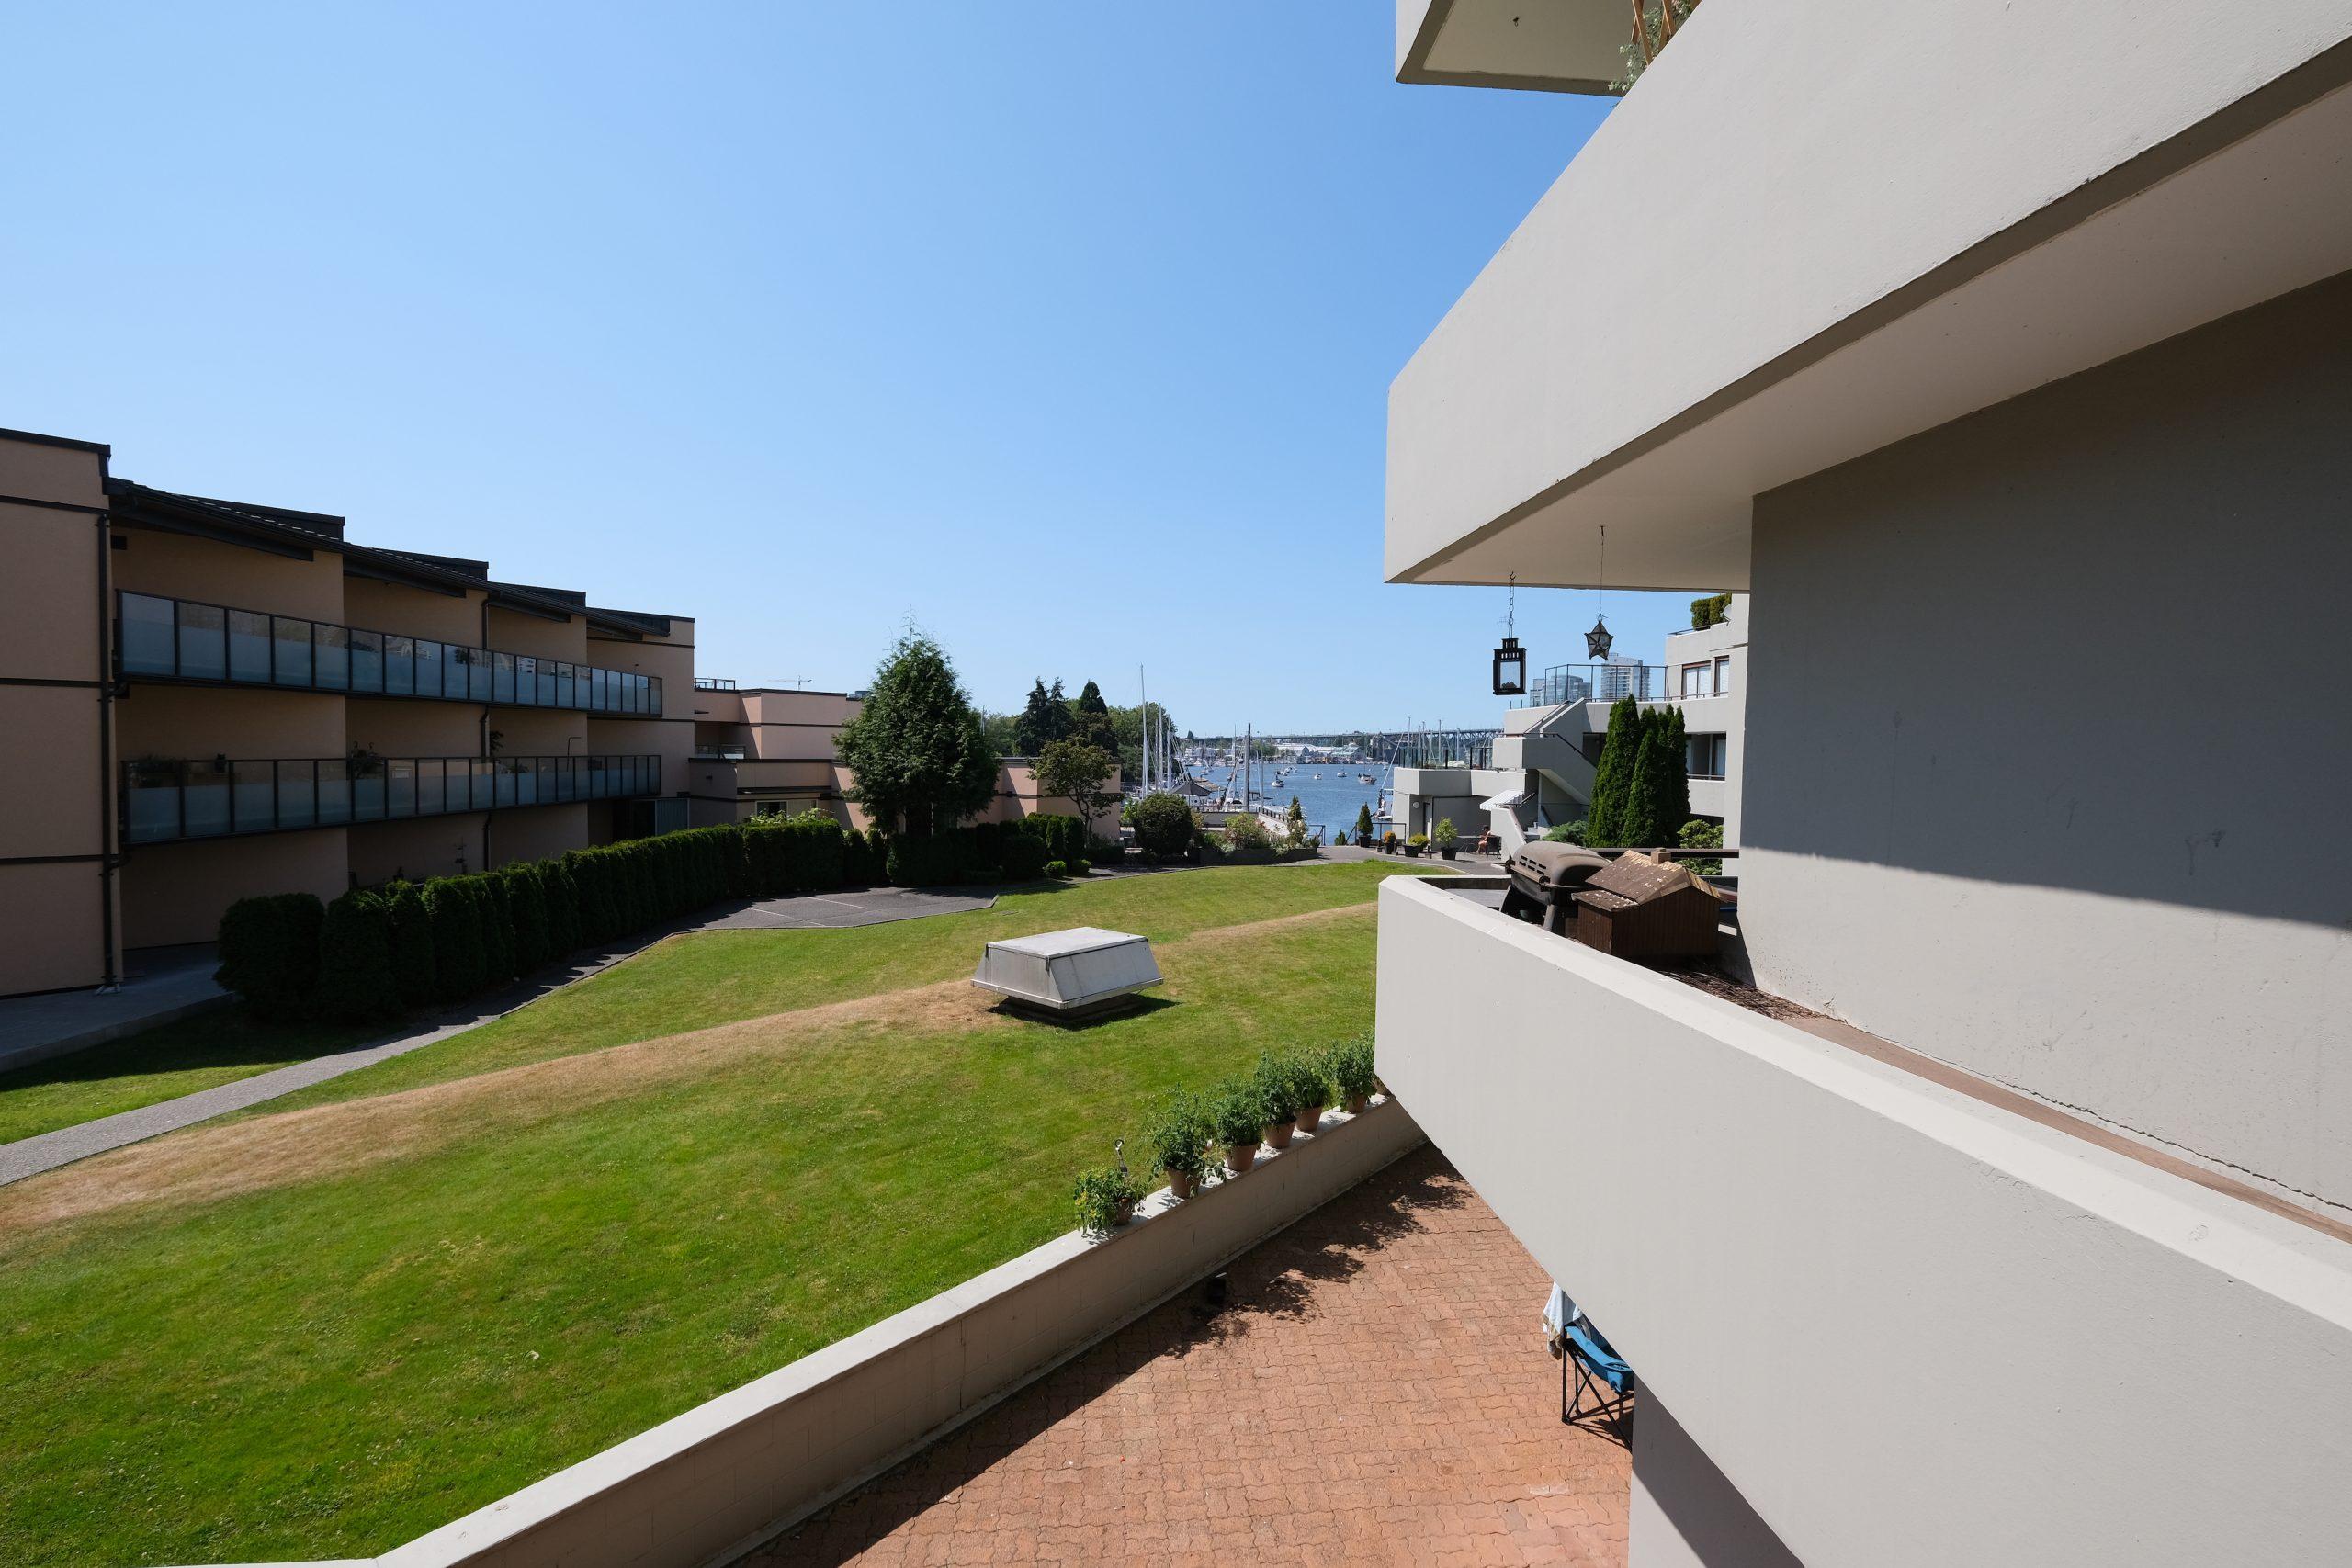 203-627-courtyard-view